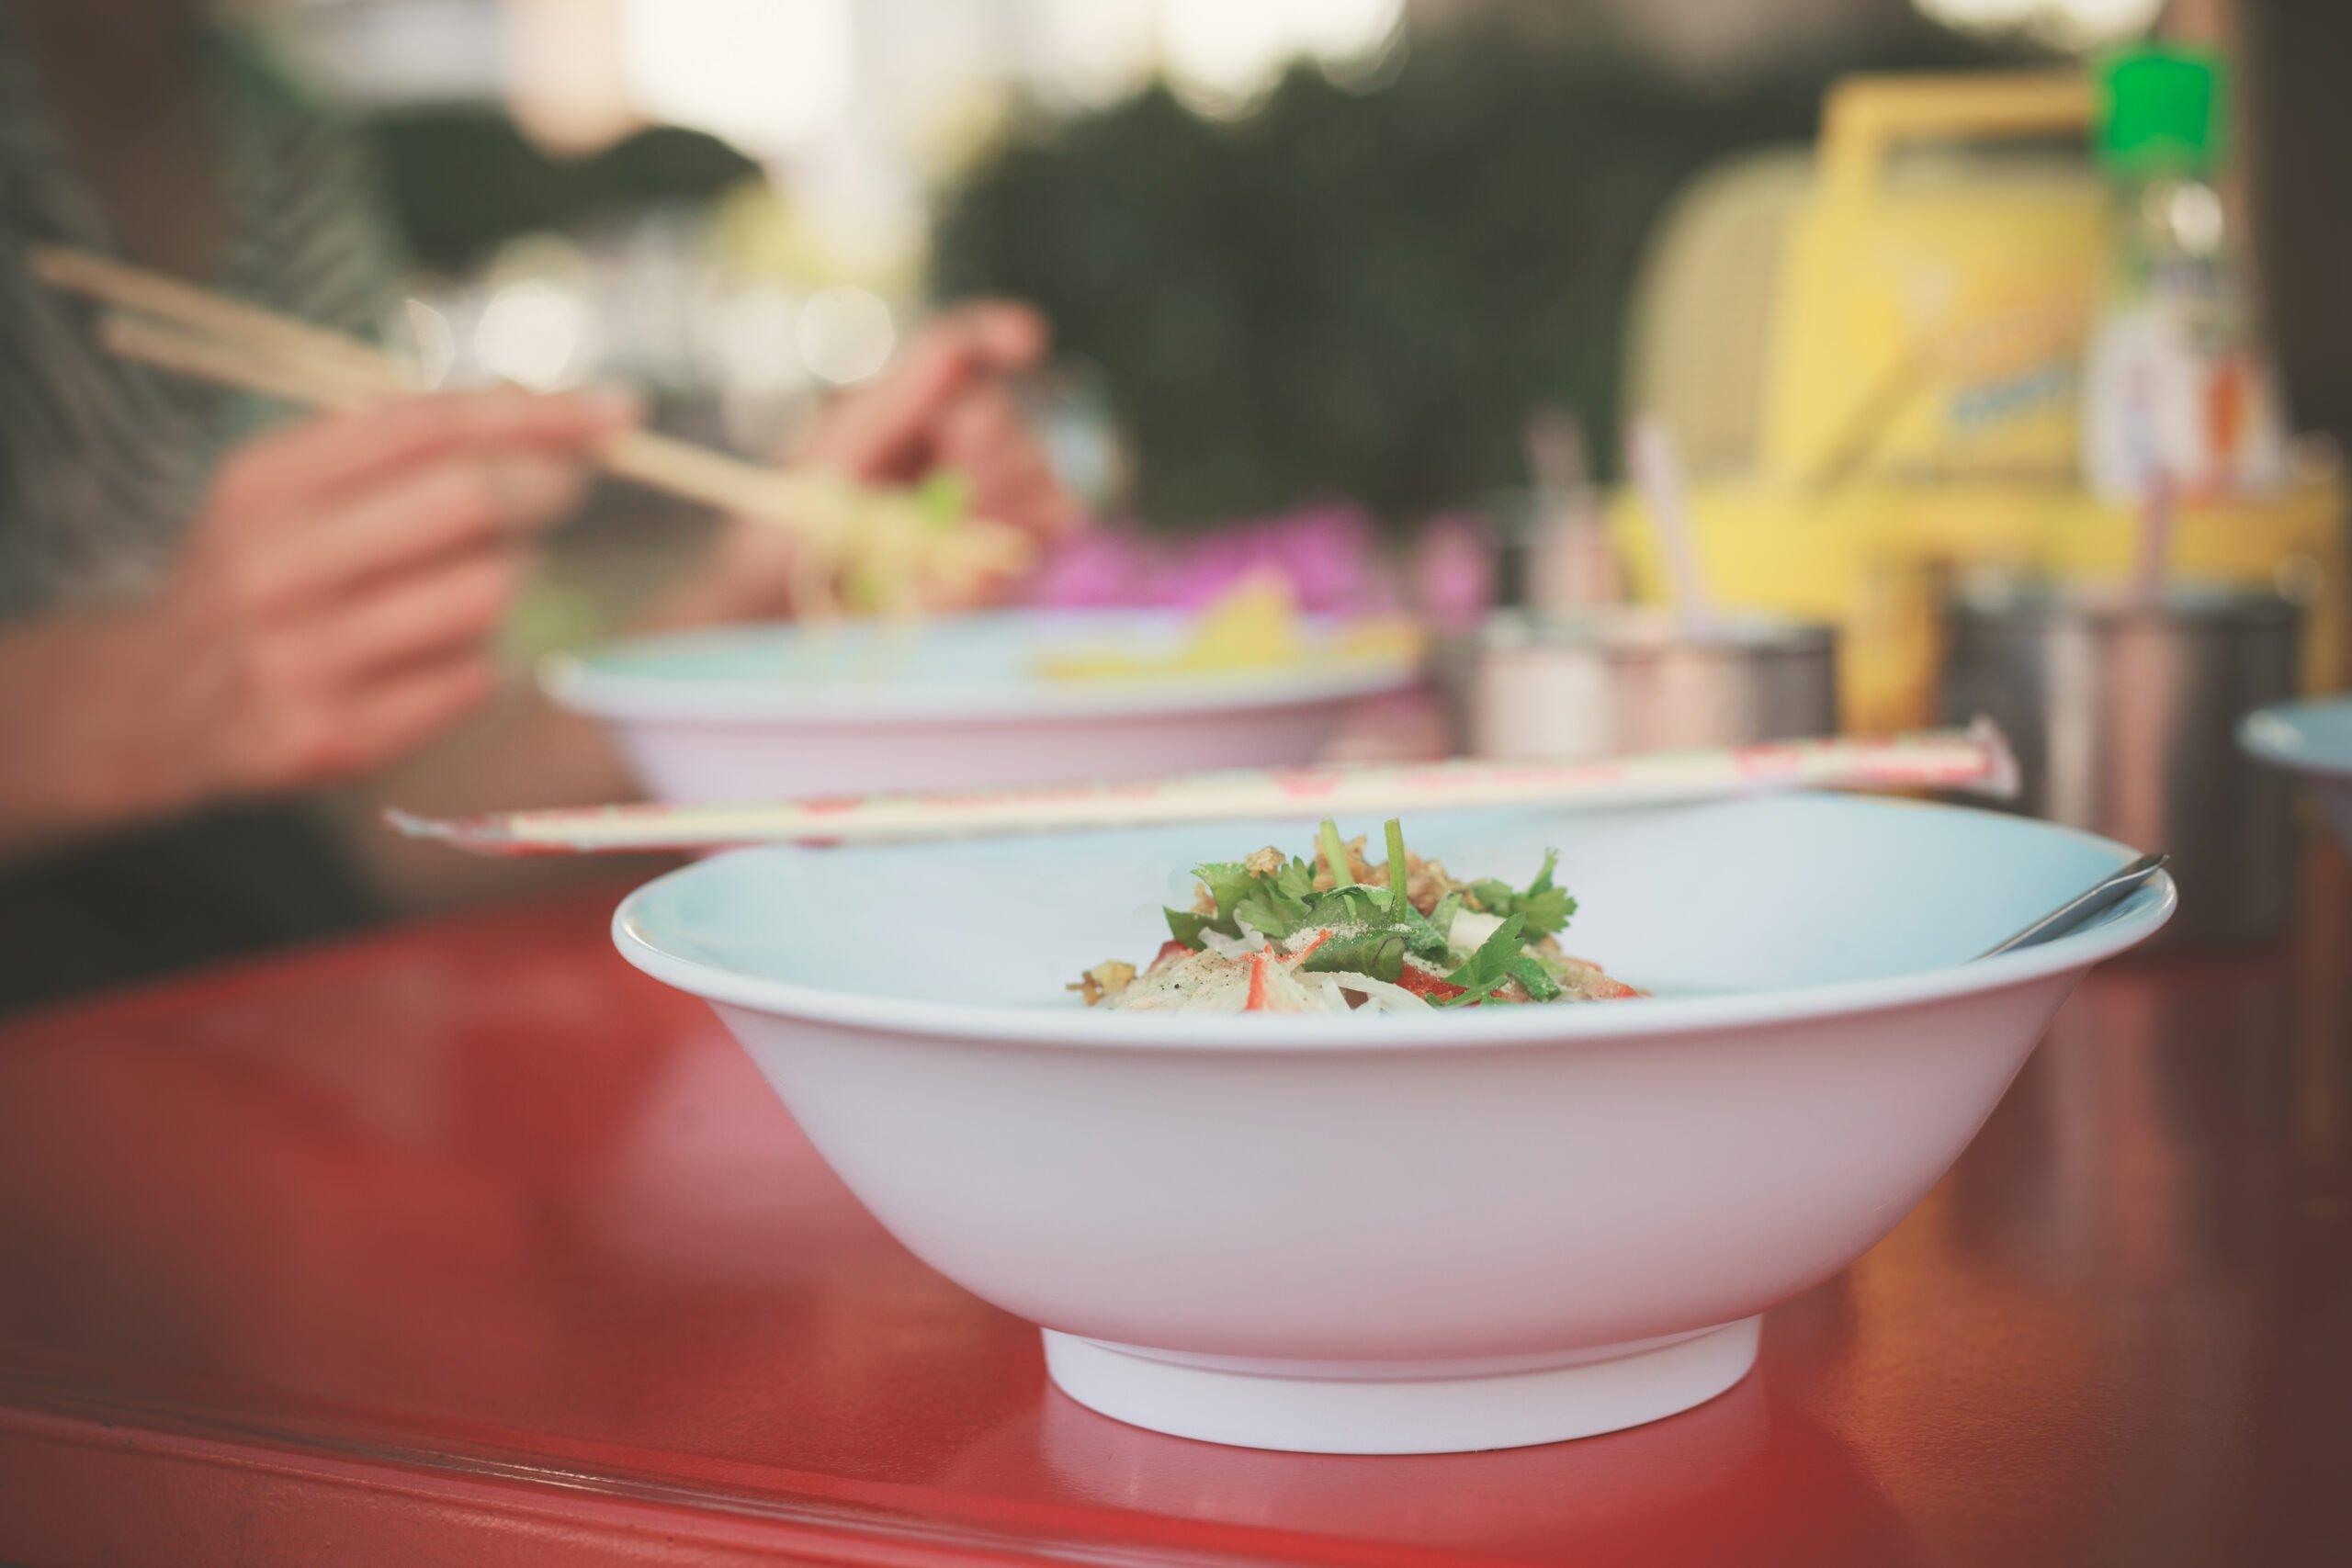 Eat Seasonal Suzhou Noodles In Our Suzhou Alleyway Walking Food Tour